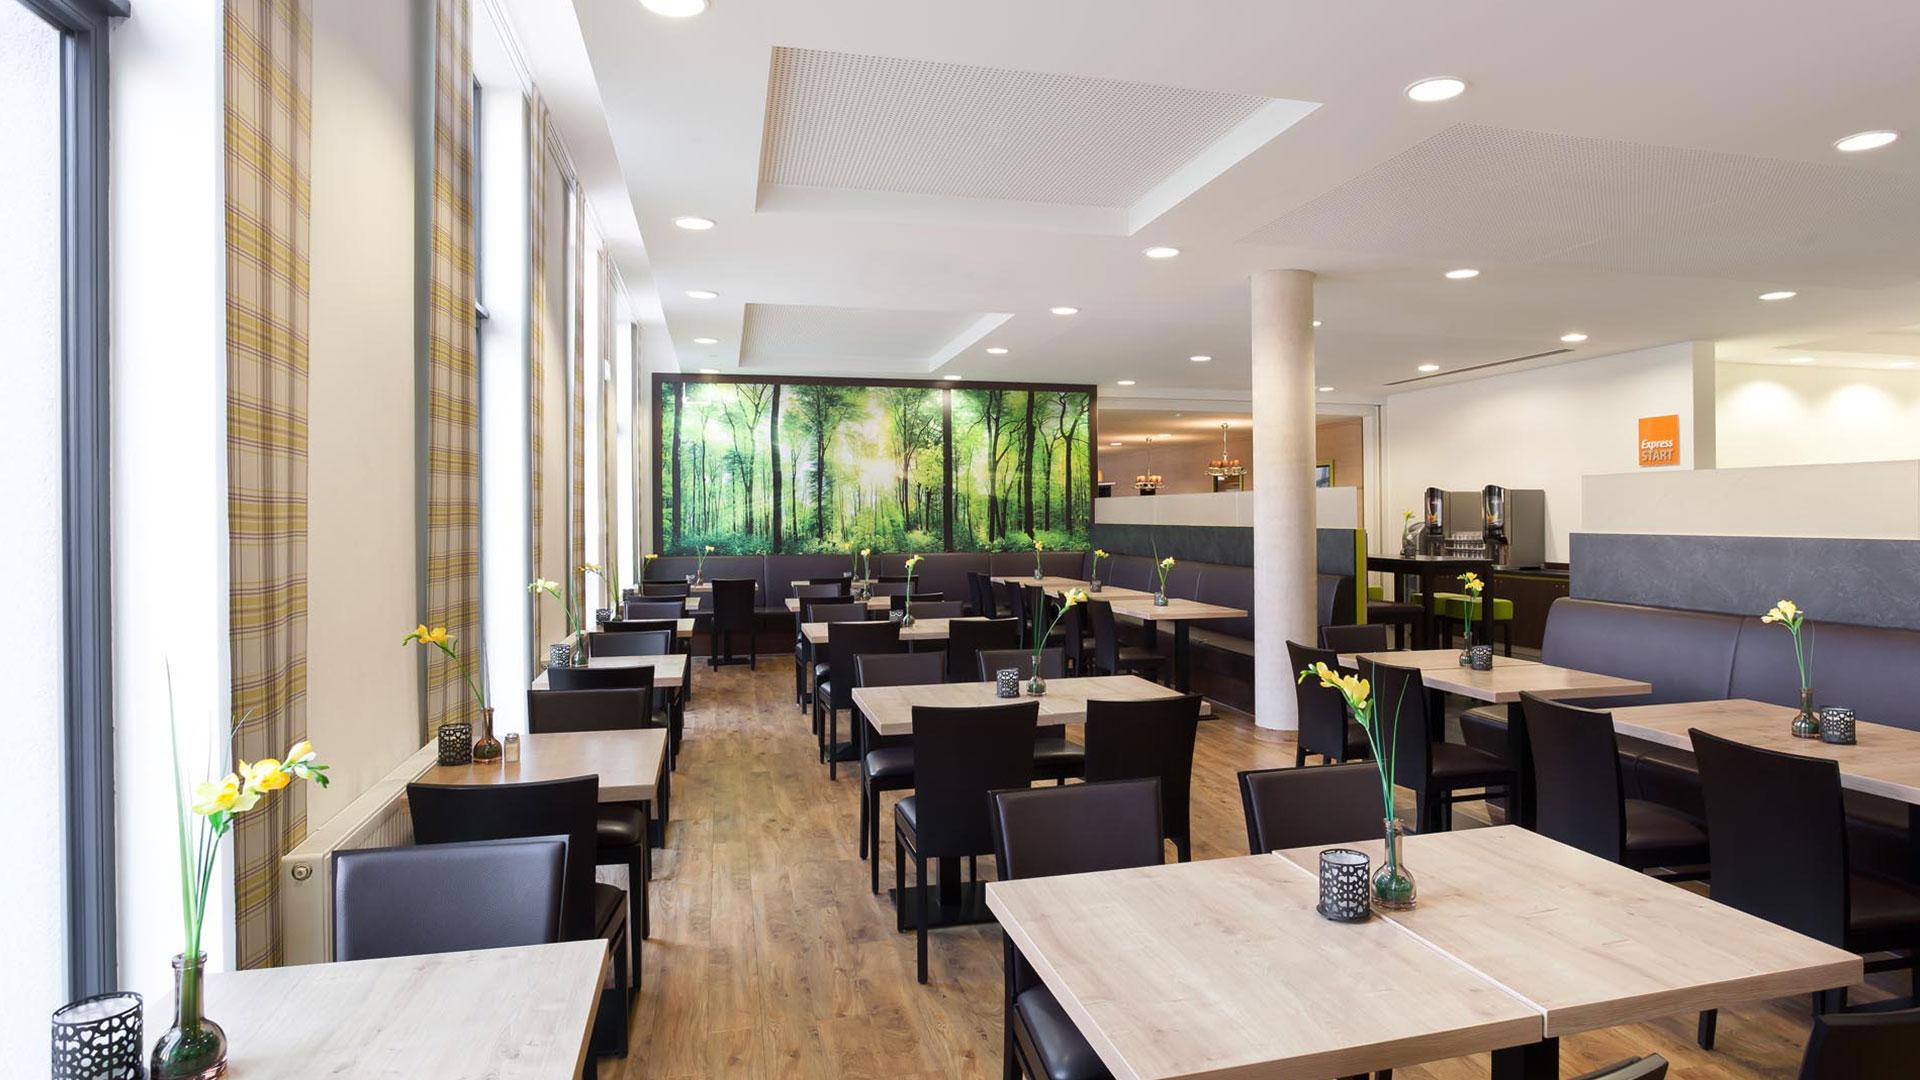 Foto des Restaurants - 01 - Holiday Inn Express Augsburg